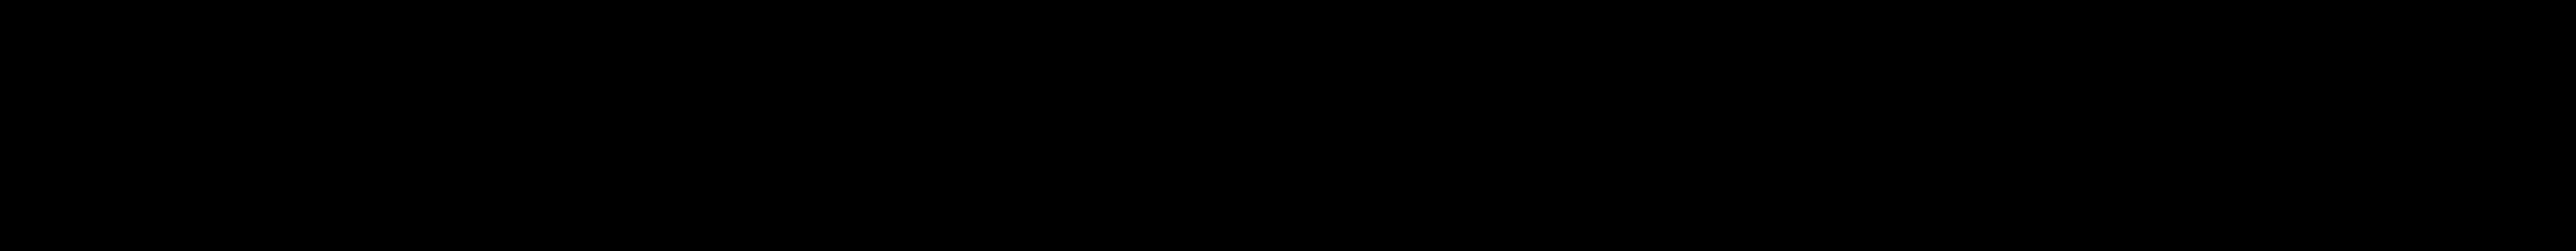 Logos-noir-fond-transparent